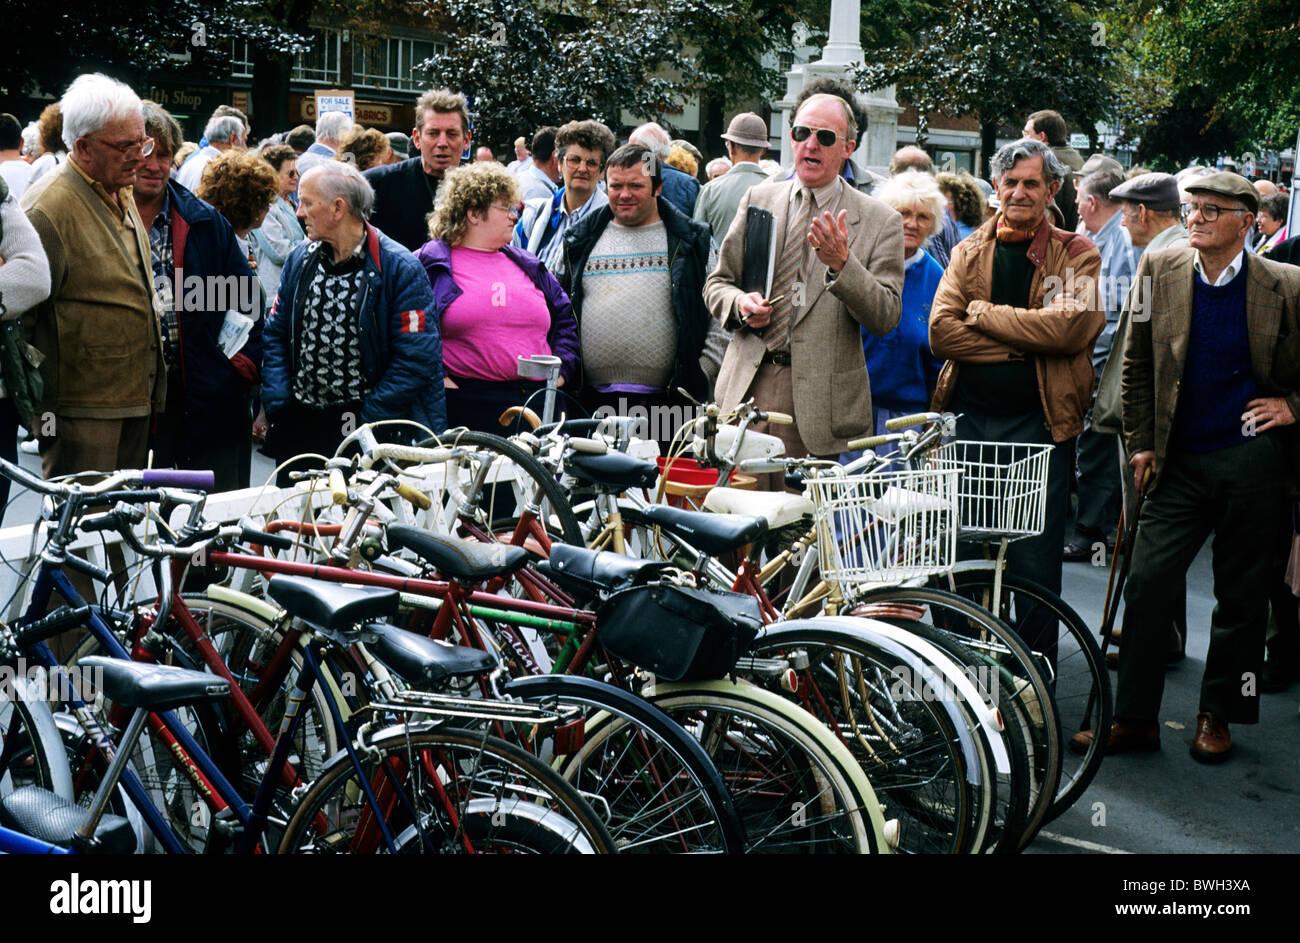 street bike auction